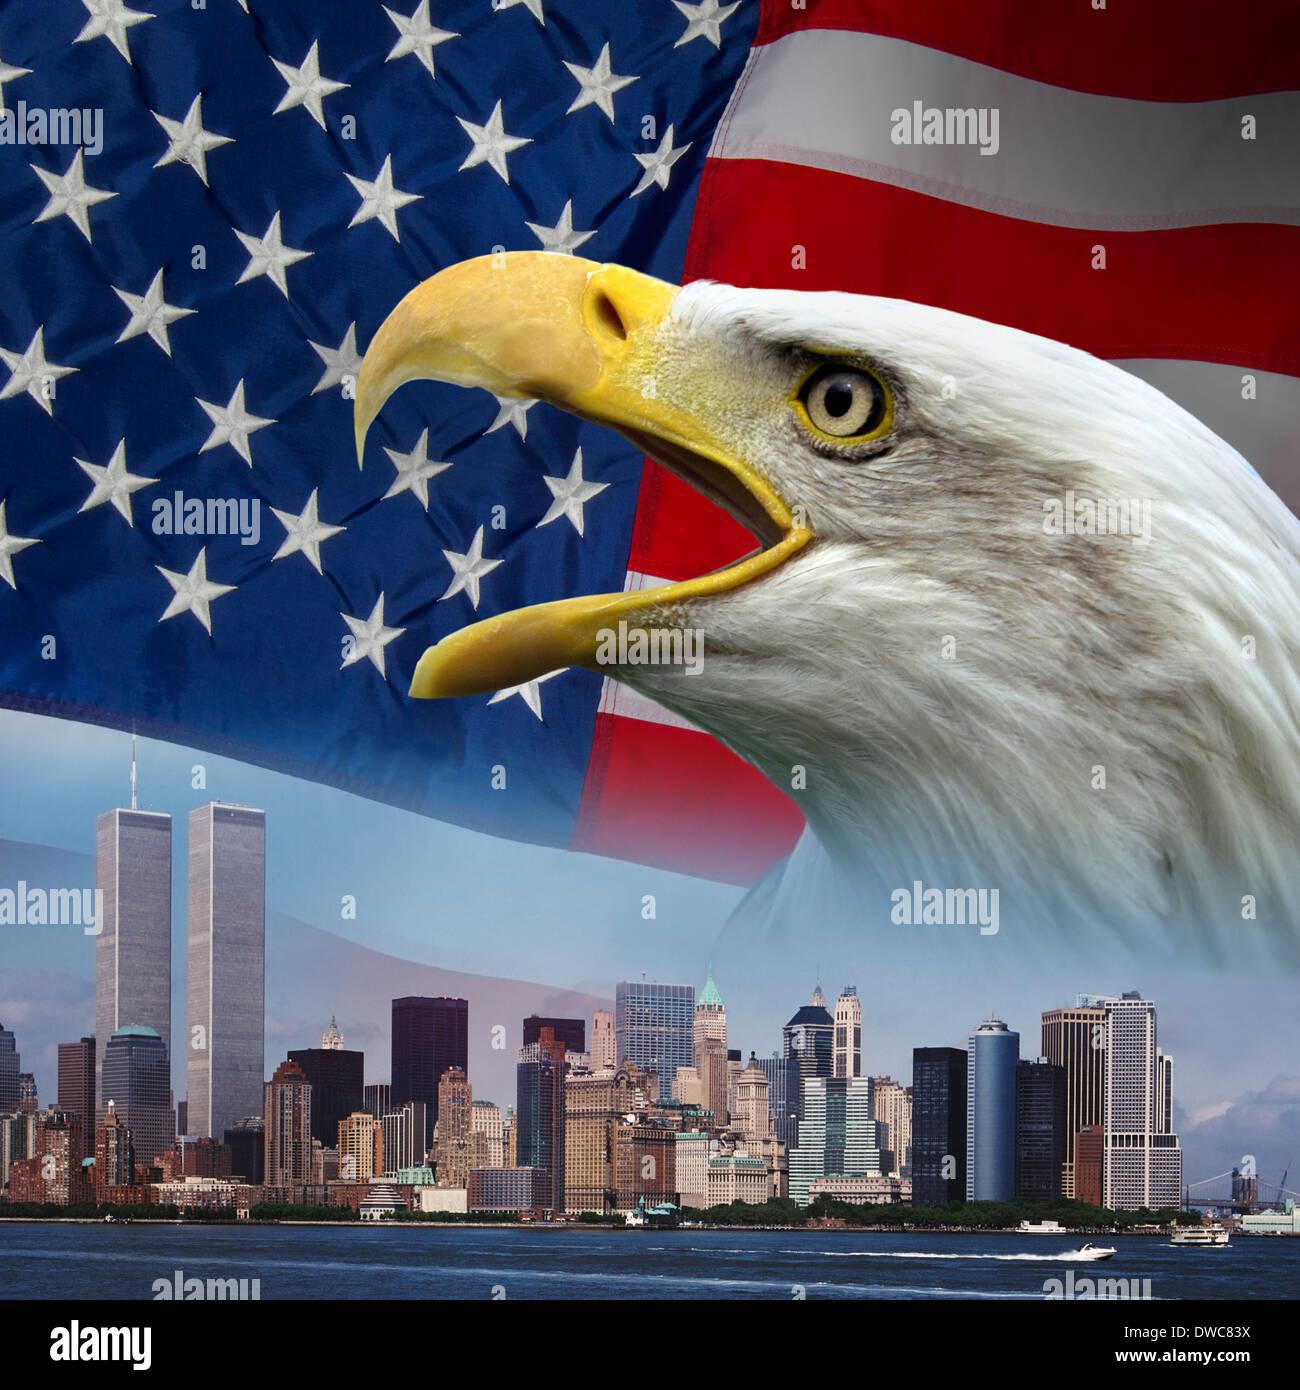 Patriotic Symbols To Remember 9 11 Stock Photo 67267310 Alamy